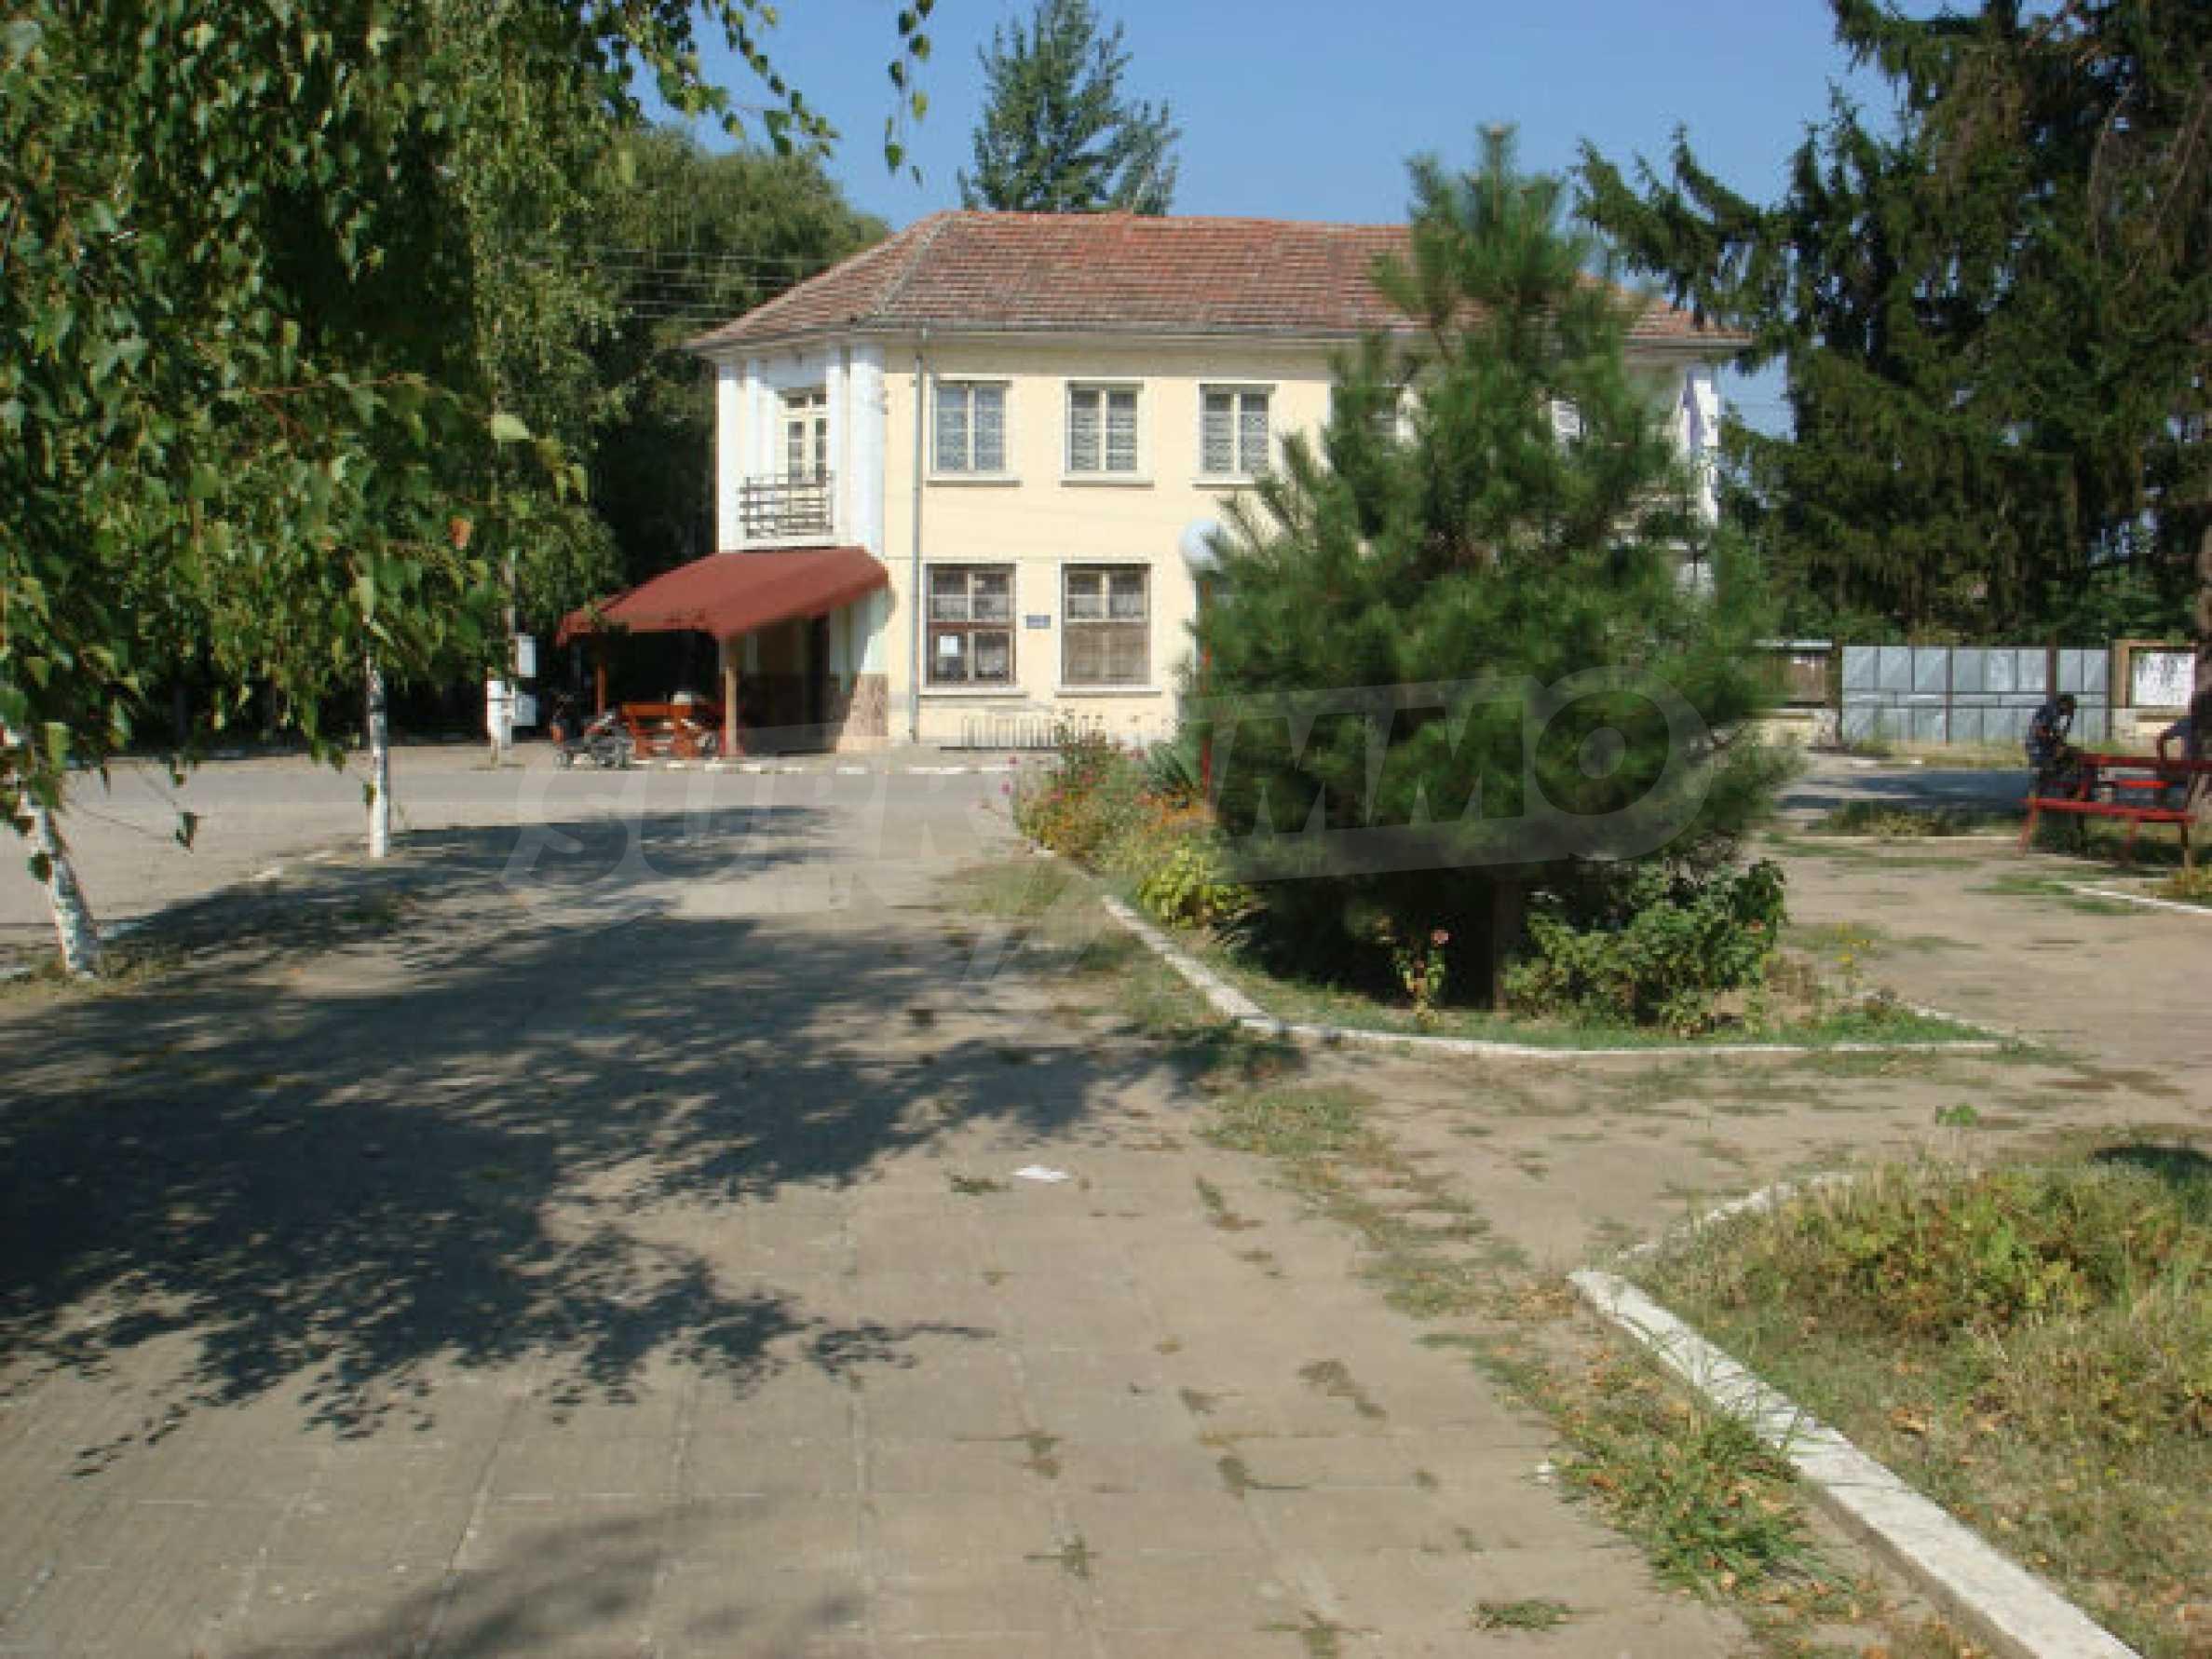 House for sale in village near Vidin 20